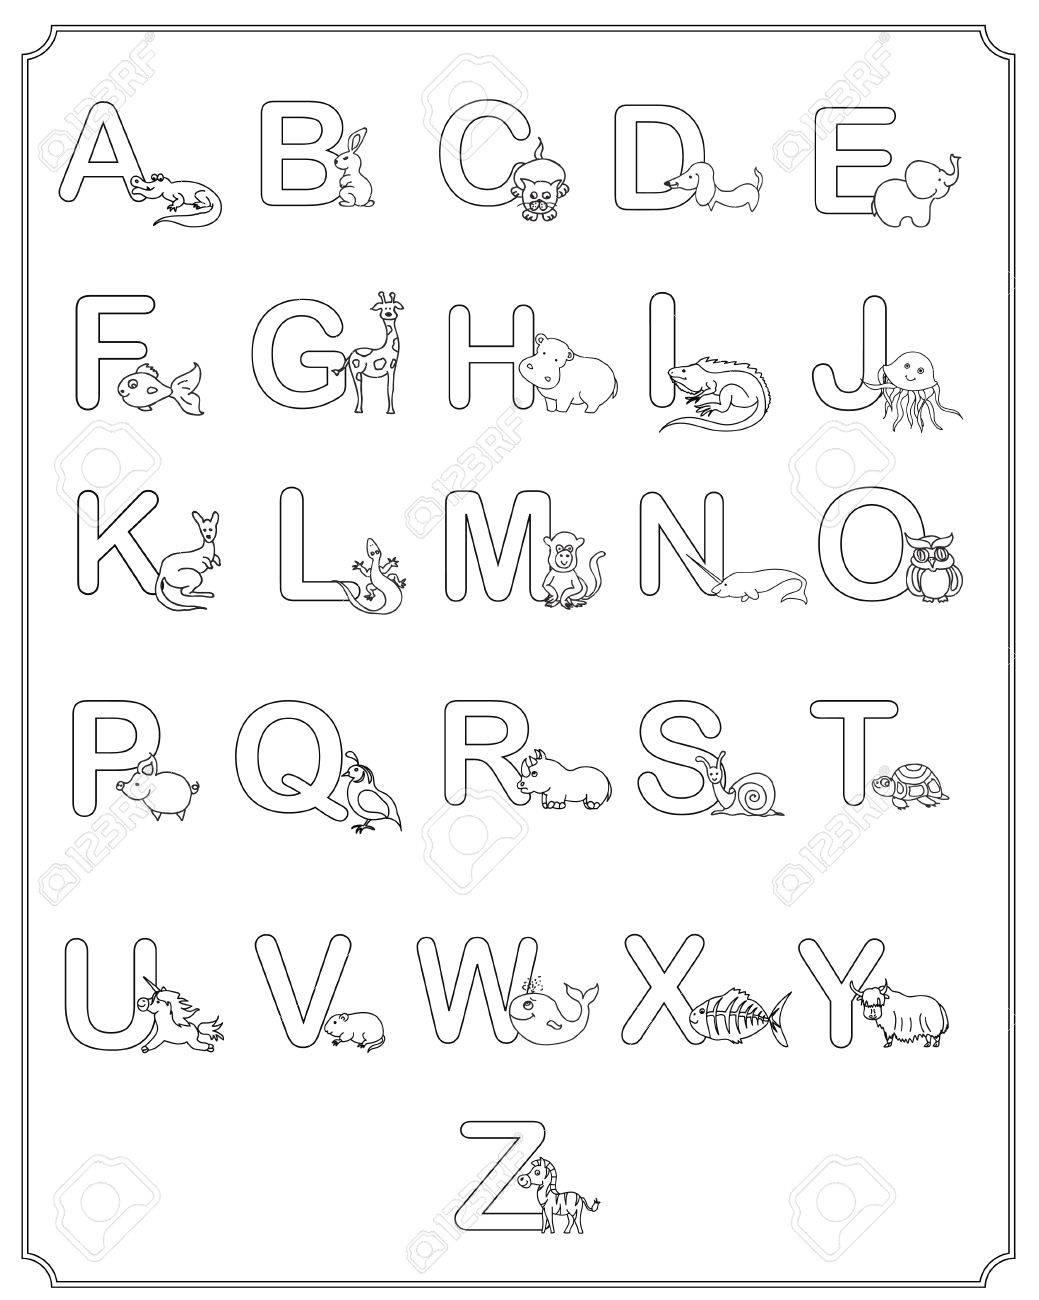 Alphabet Baby Animals ABC Children Coloring Page Stock Photo